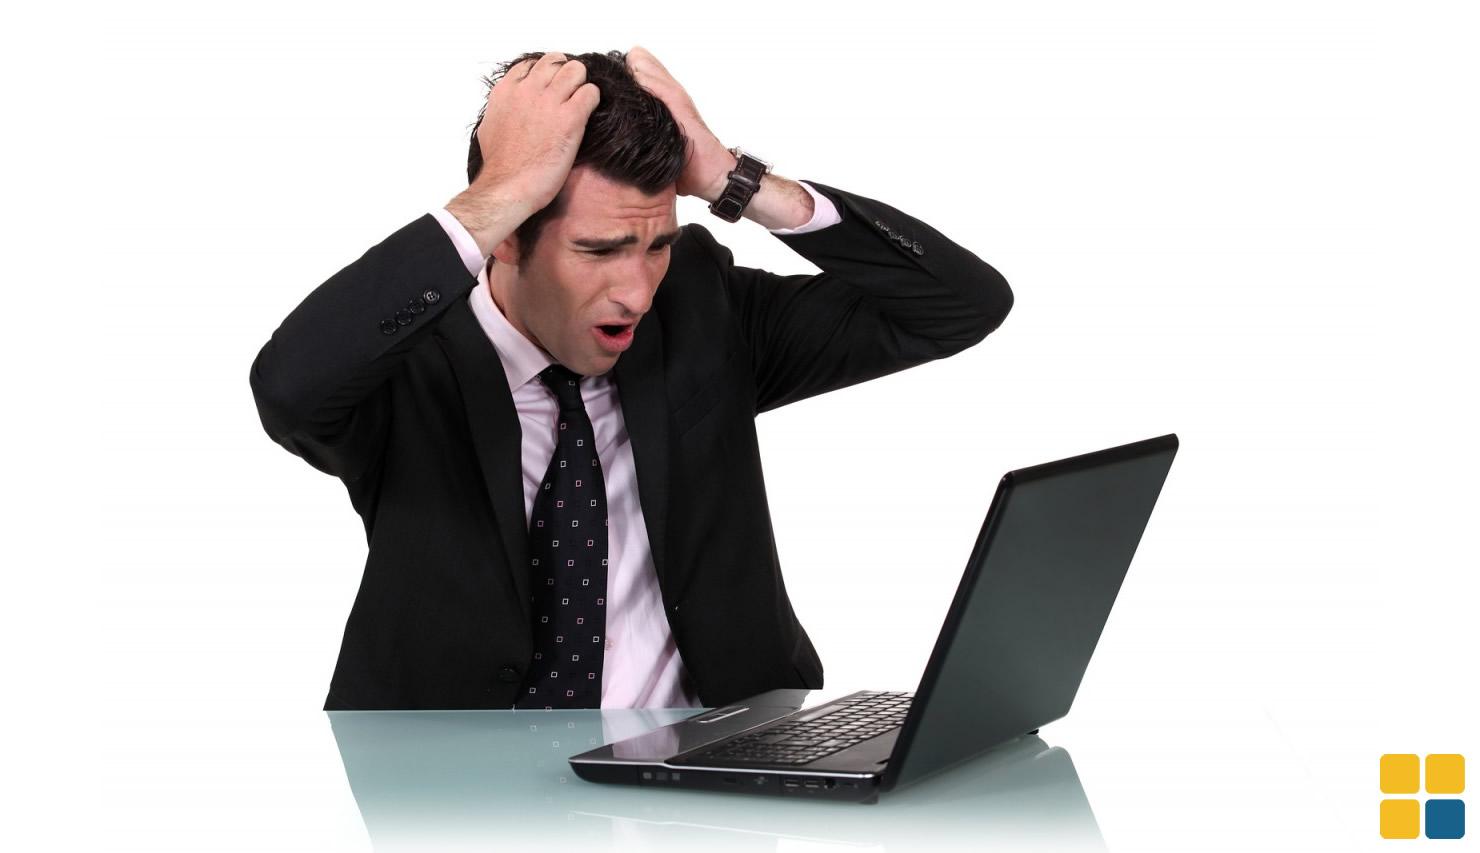 Desespero, laptop com vírus